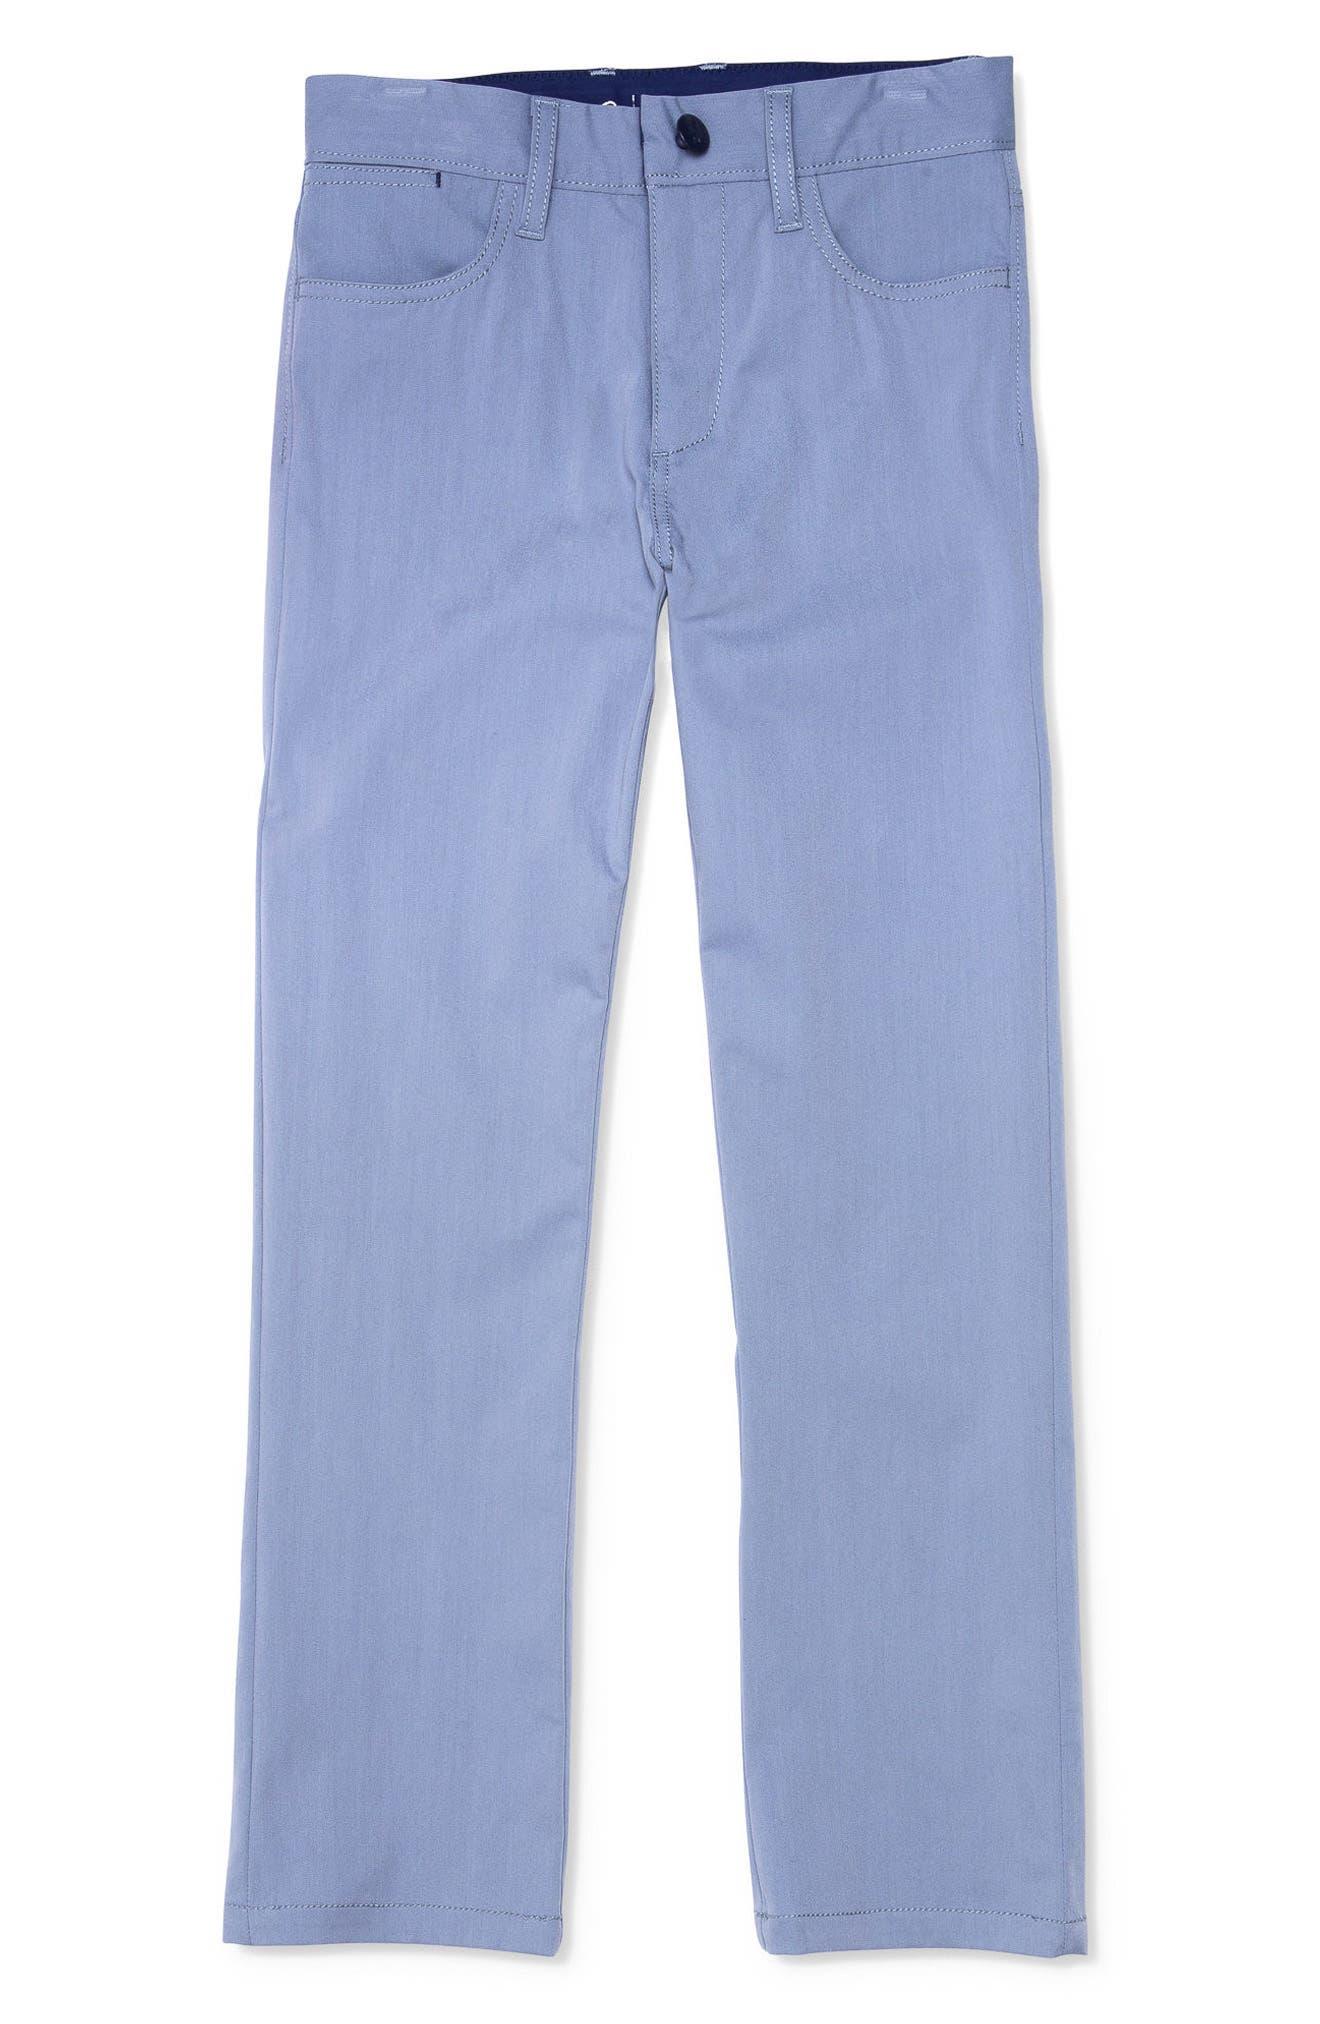 Marin Pants,                         Main,                         color, Cloudbreak